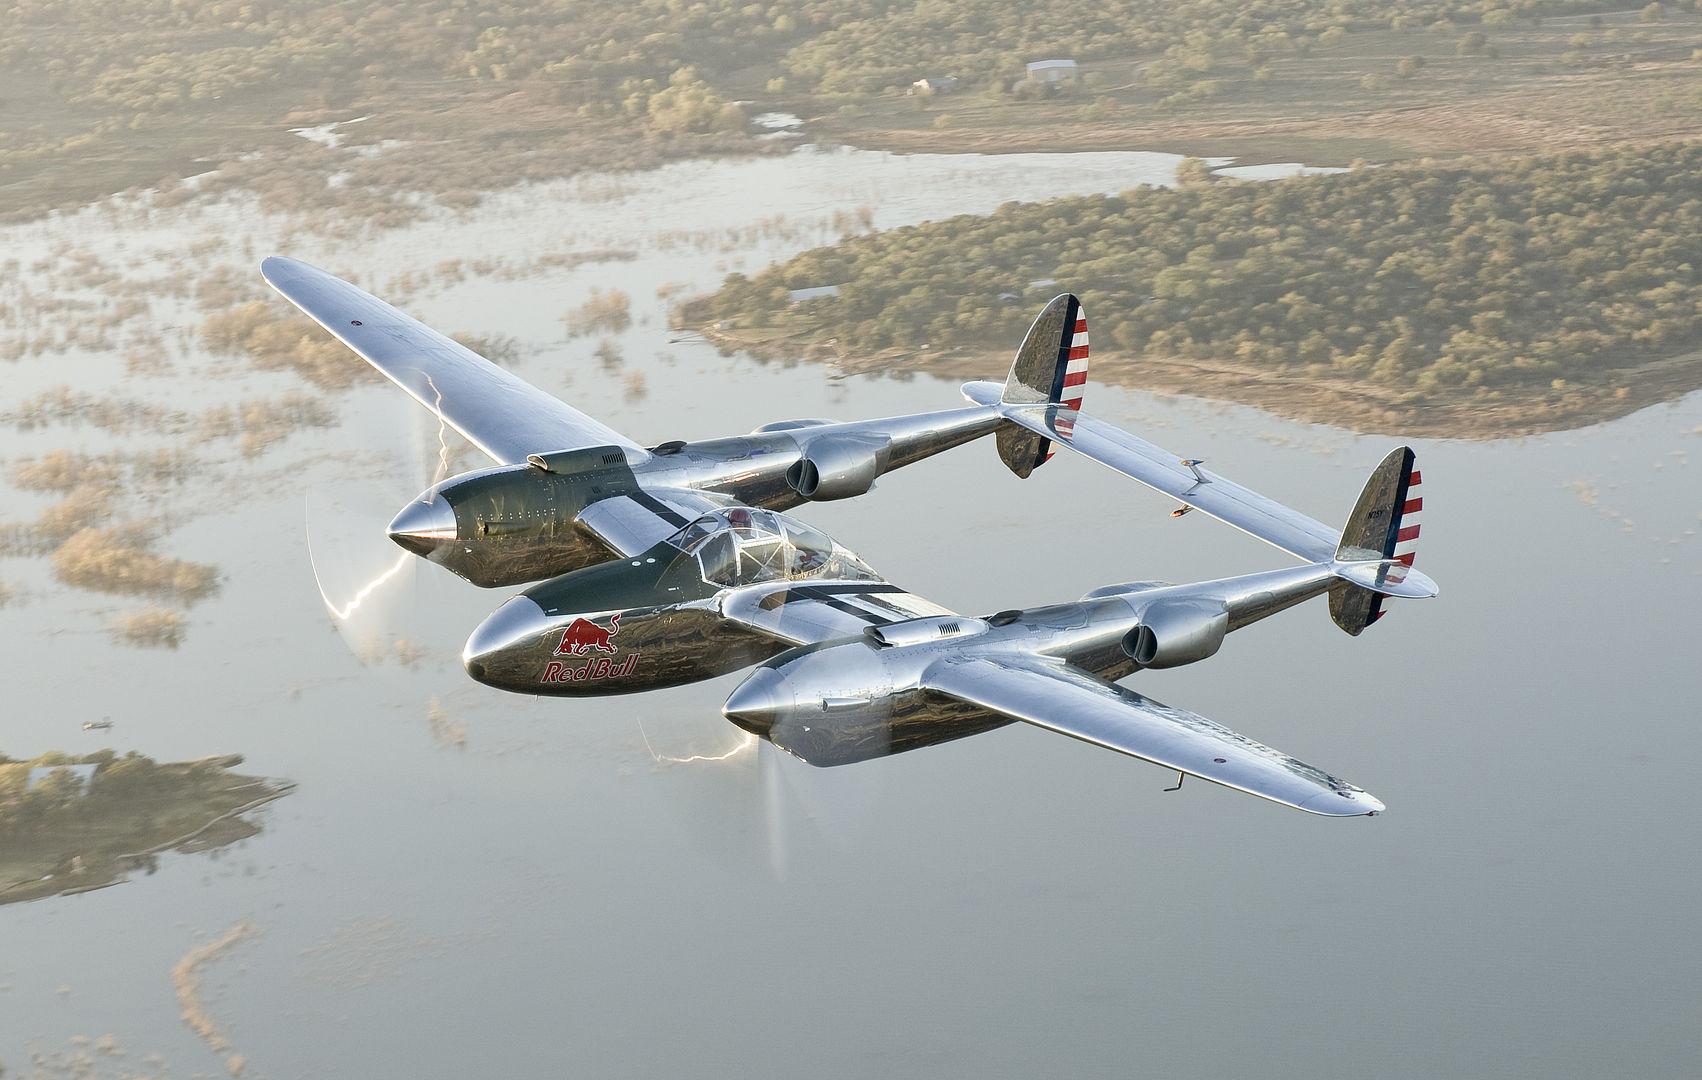 Lockheed P-38 « Lightning »